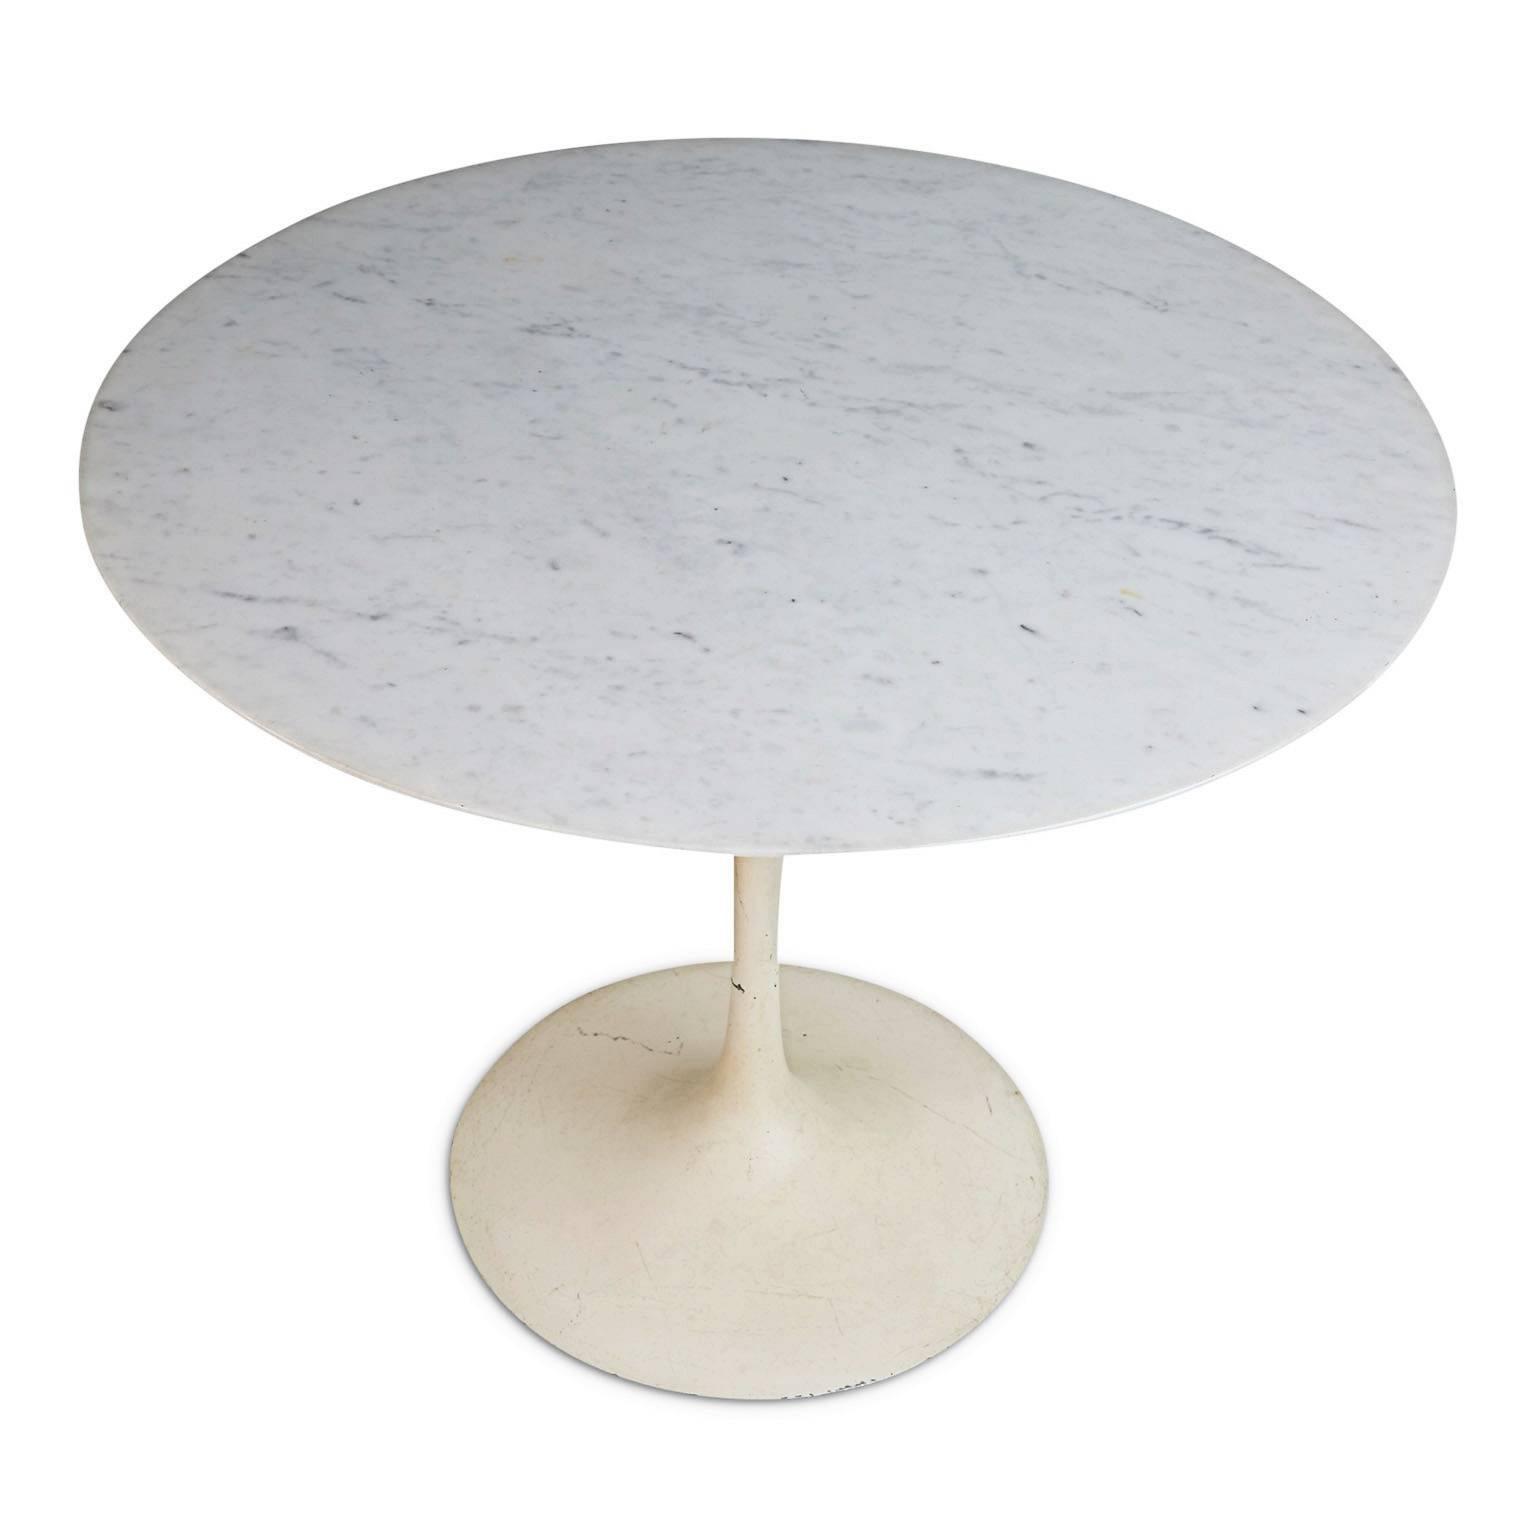 Original Marble Tulip Dining Table By Eero Saarinen For Knoll